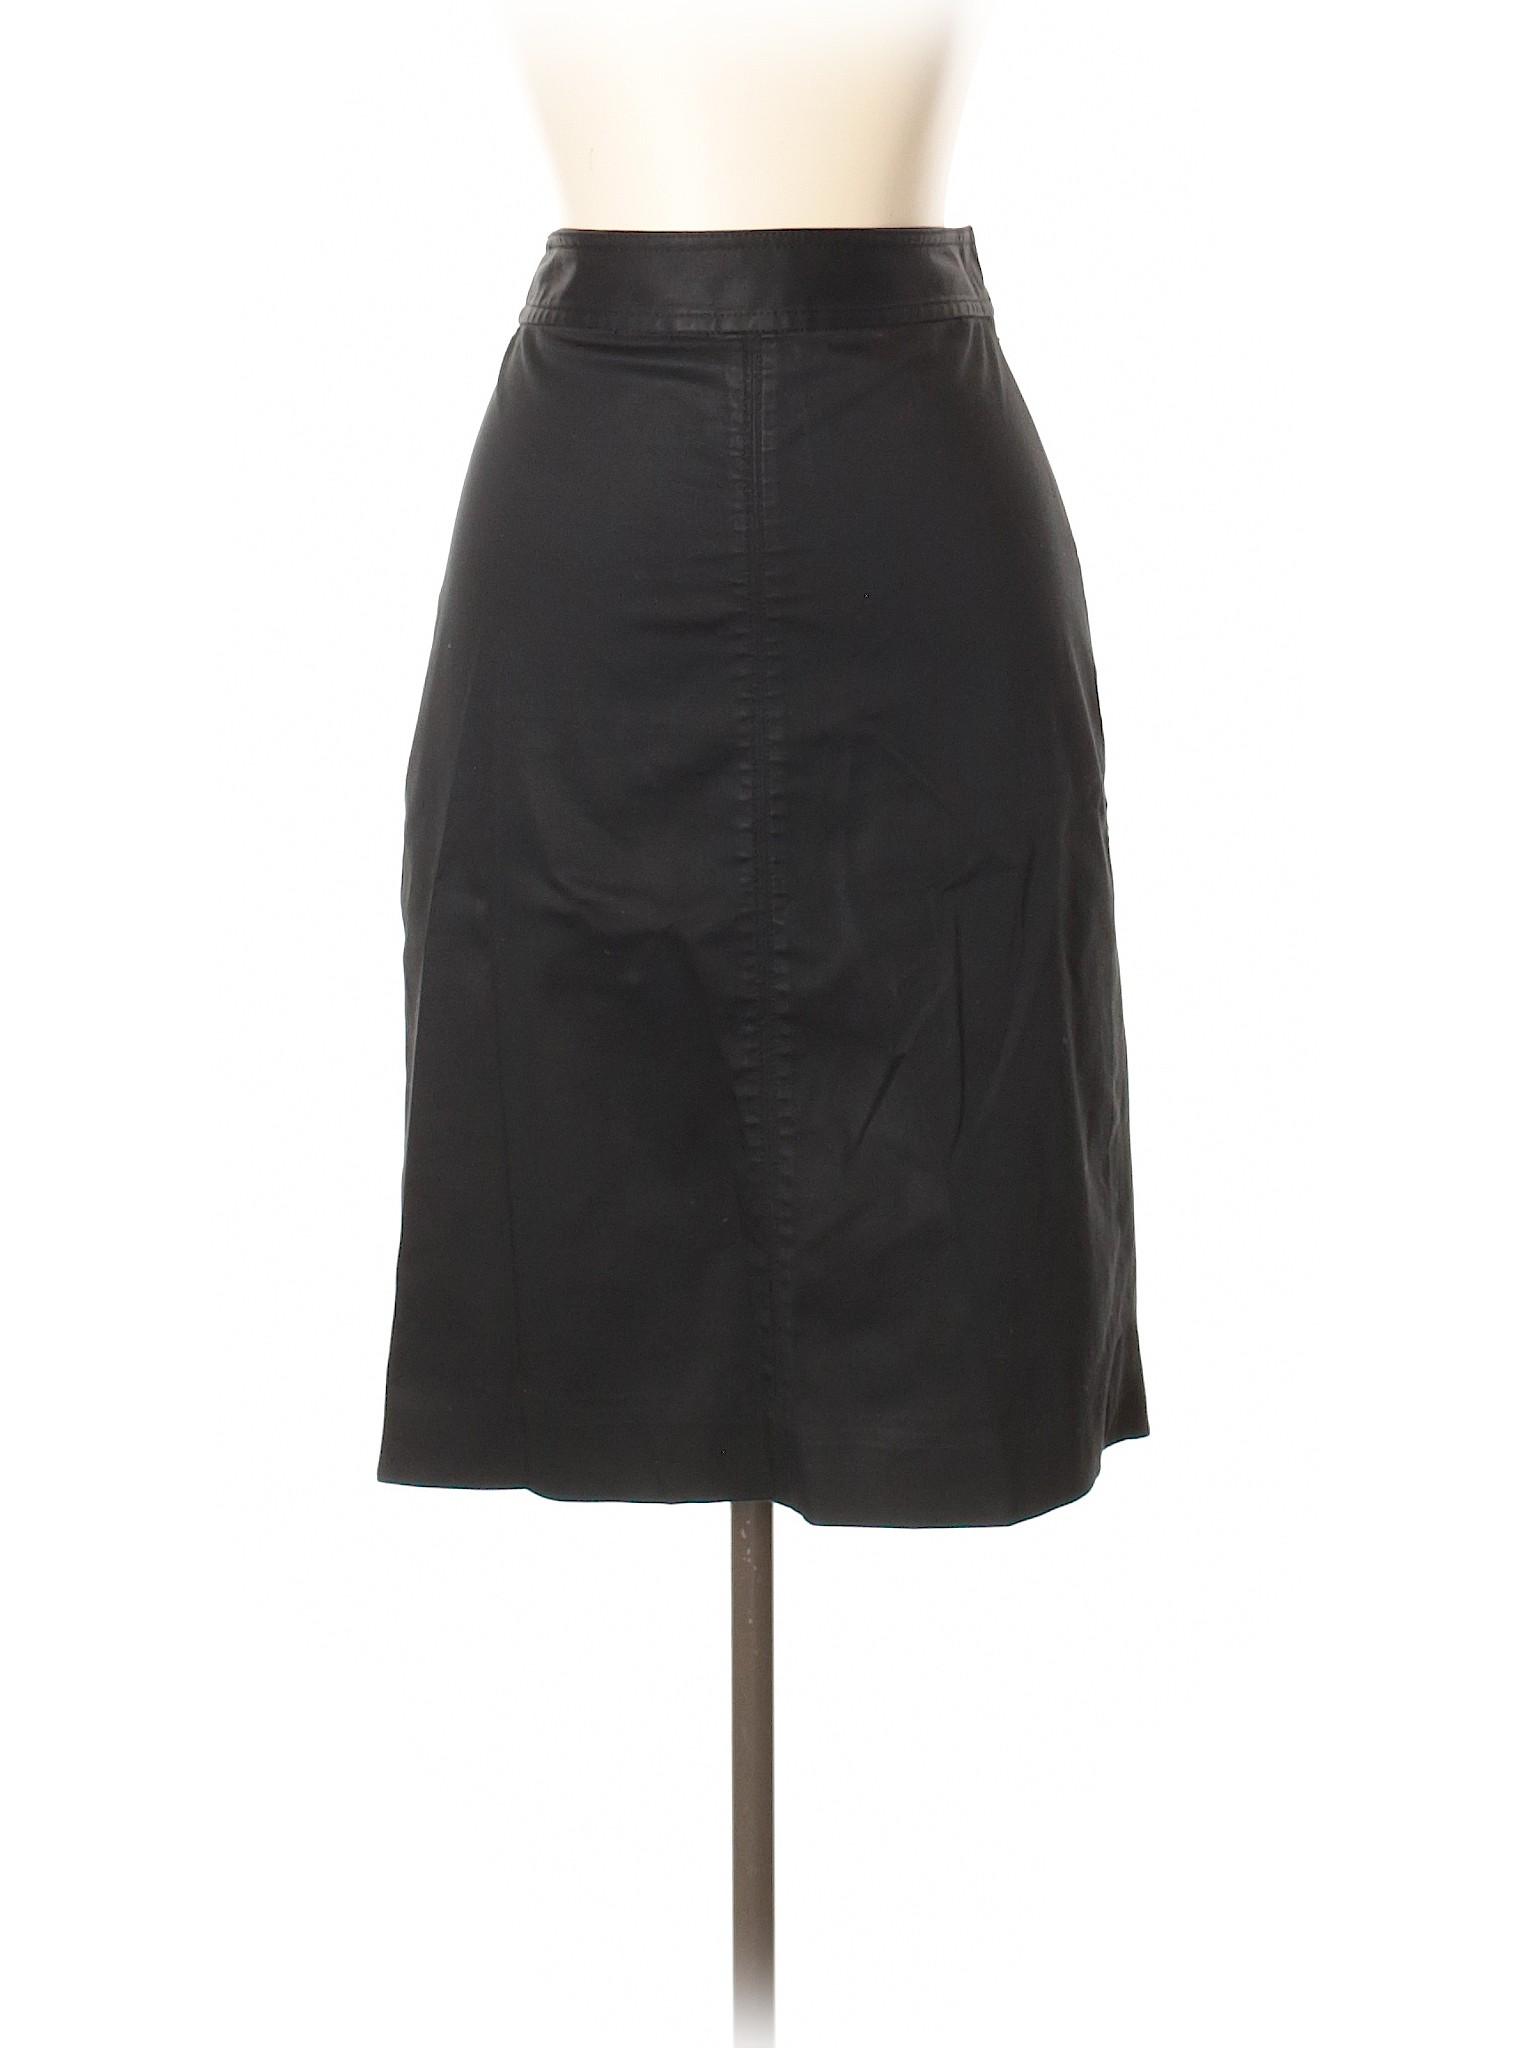 Boutique Boutique Boutique Boutique Casual Casual Casual Casual Skirt Skirt Skirt qF0nO